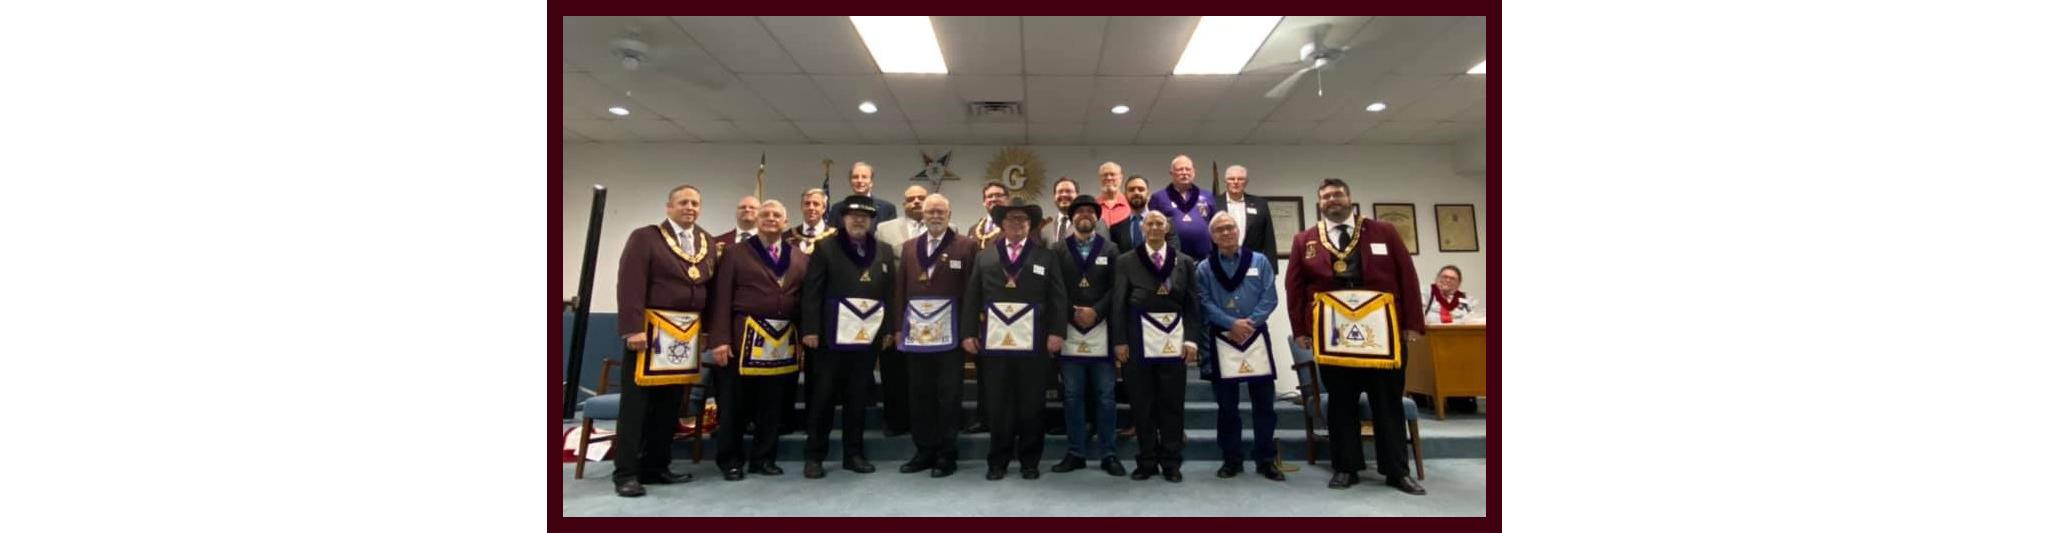 DONATE-LODGES-Grand-Council-Royal-Select-Masters-of-TX2